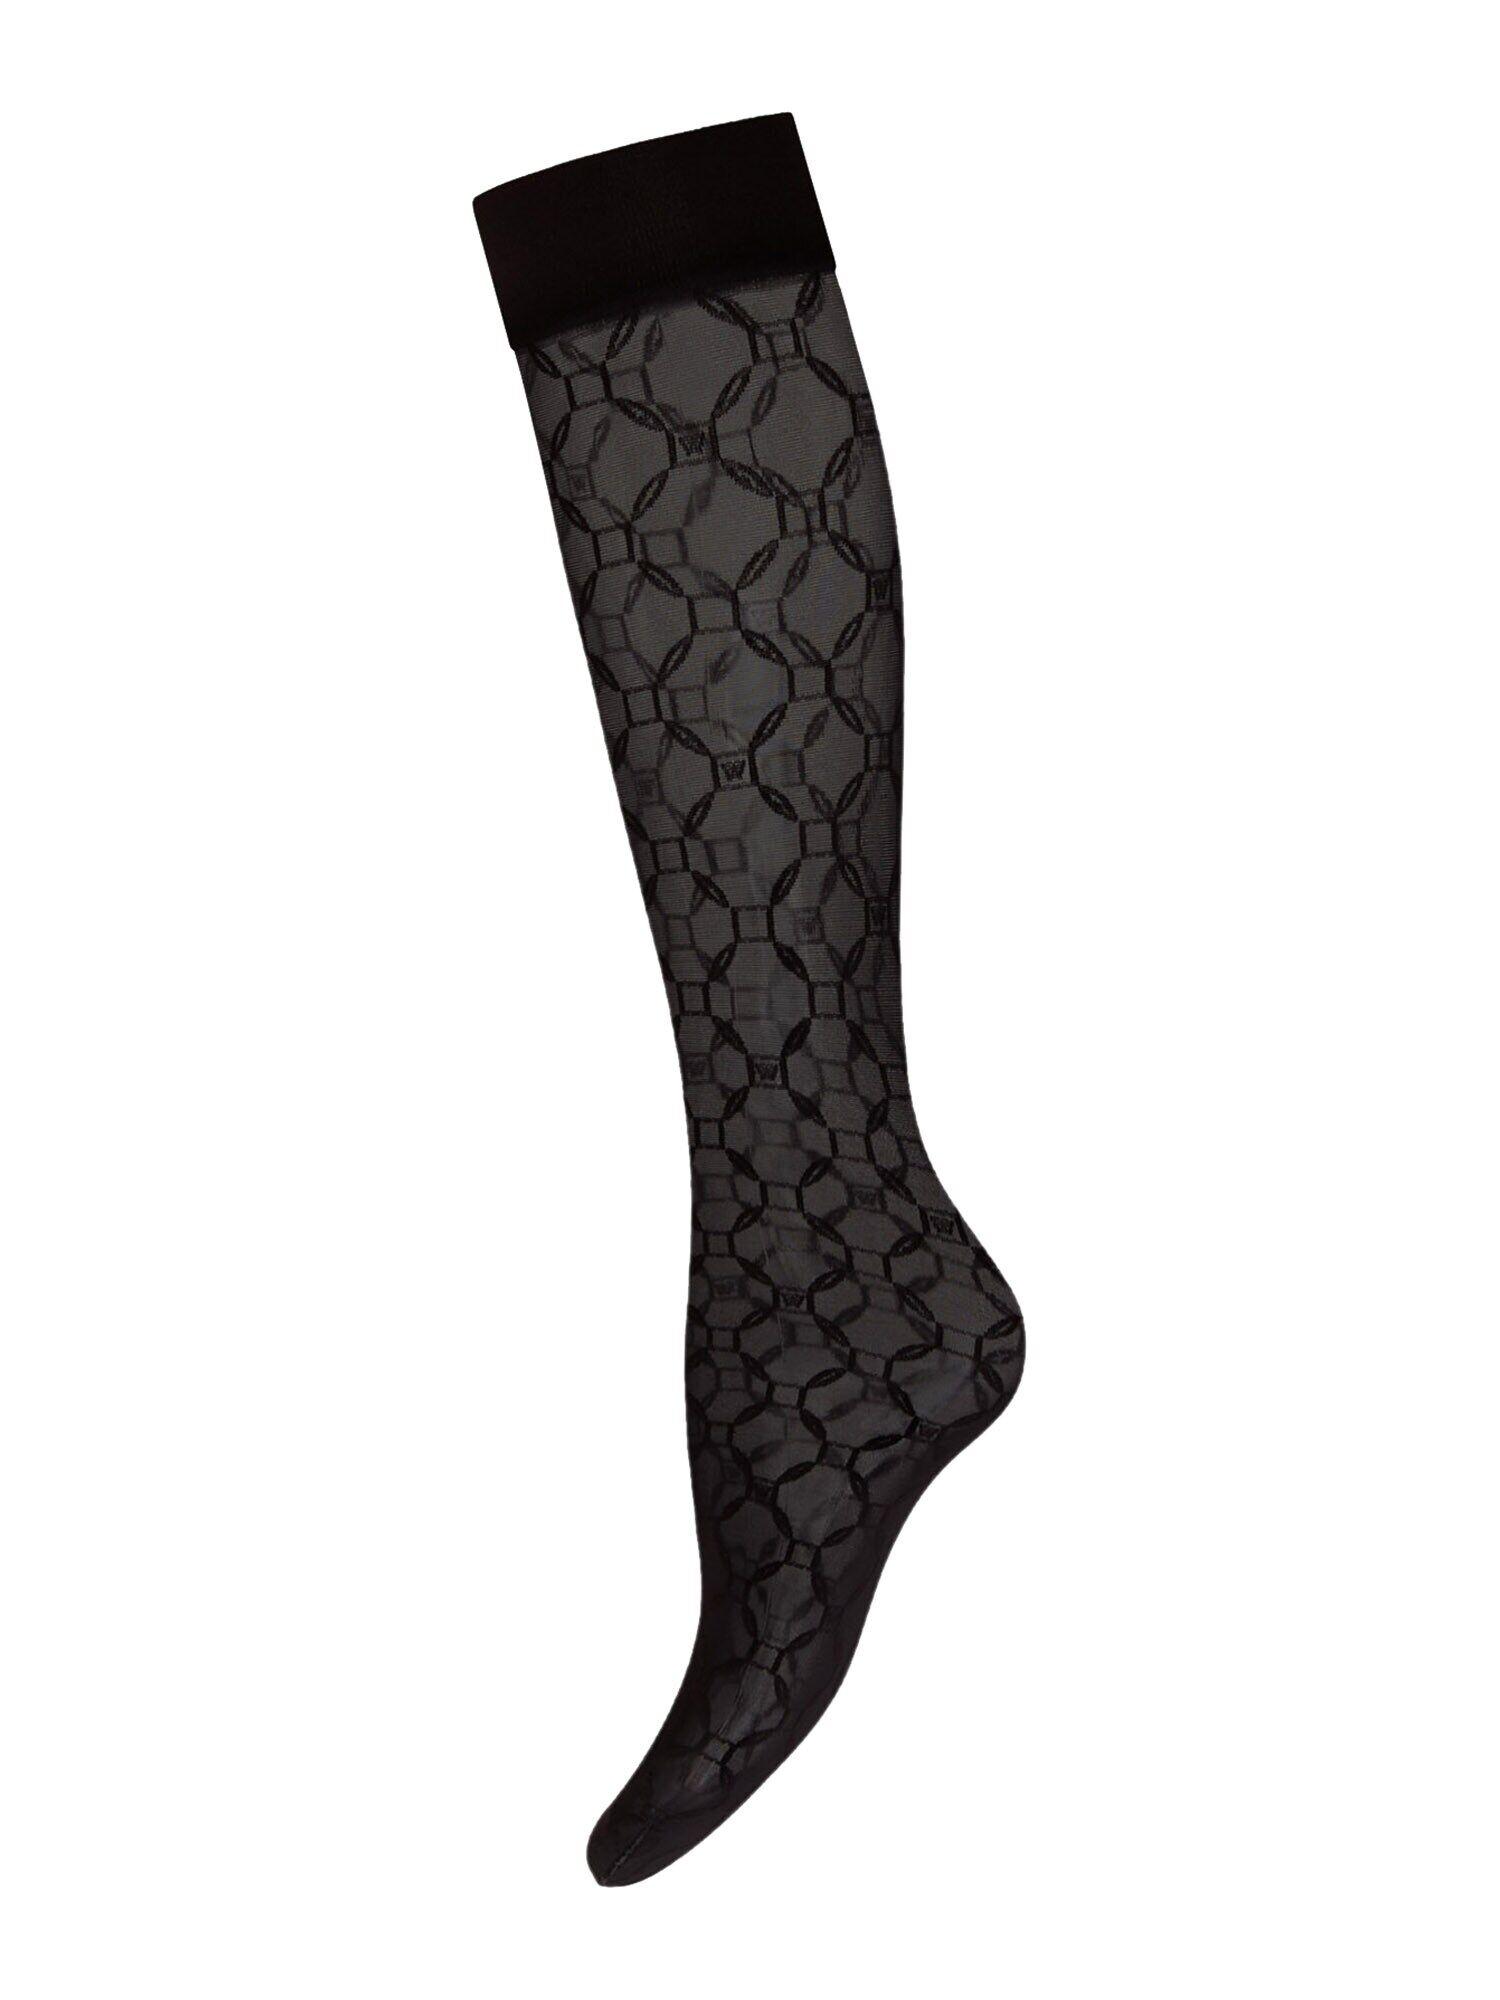 Wolford Chaussettes montantes 'Aurora'  - Noir - Taille: M - female